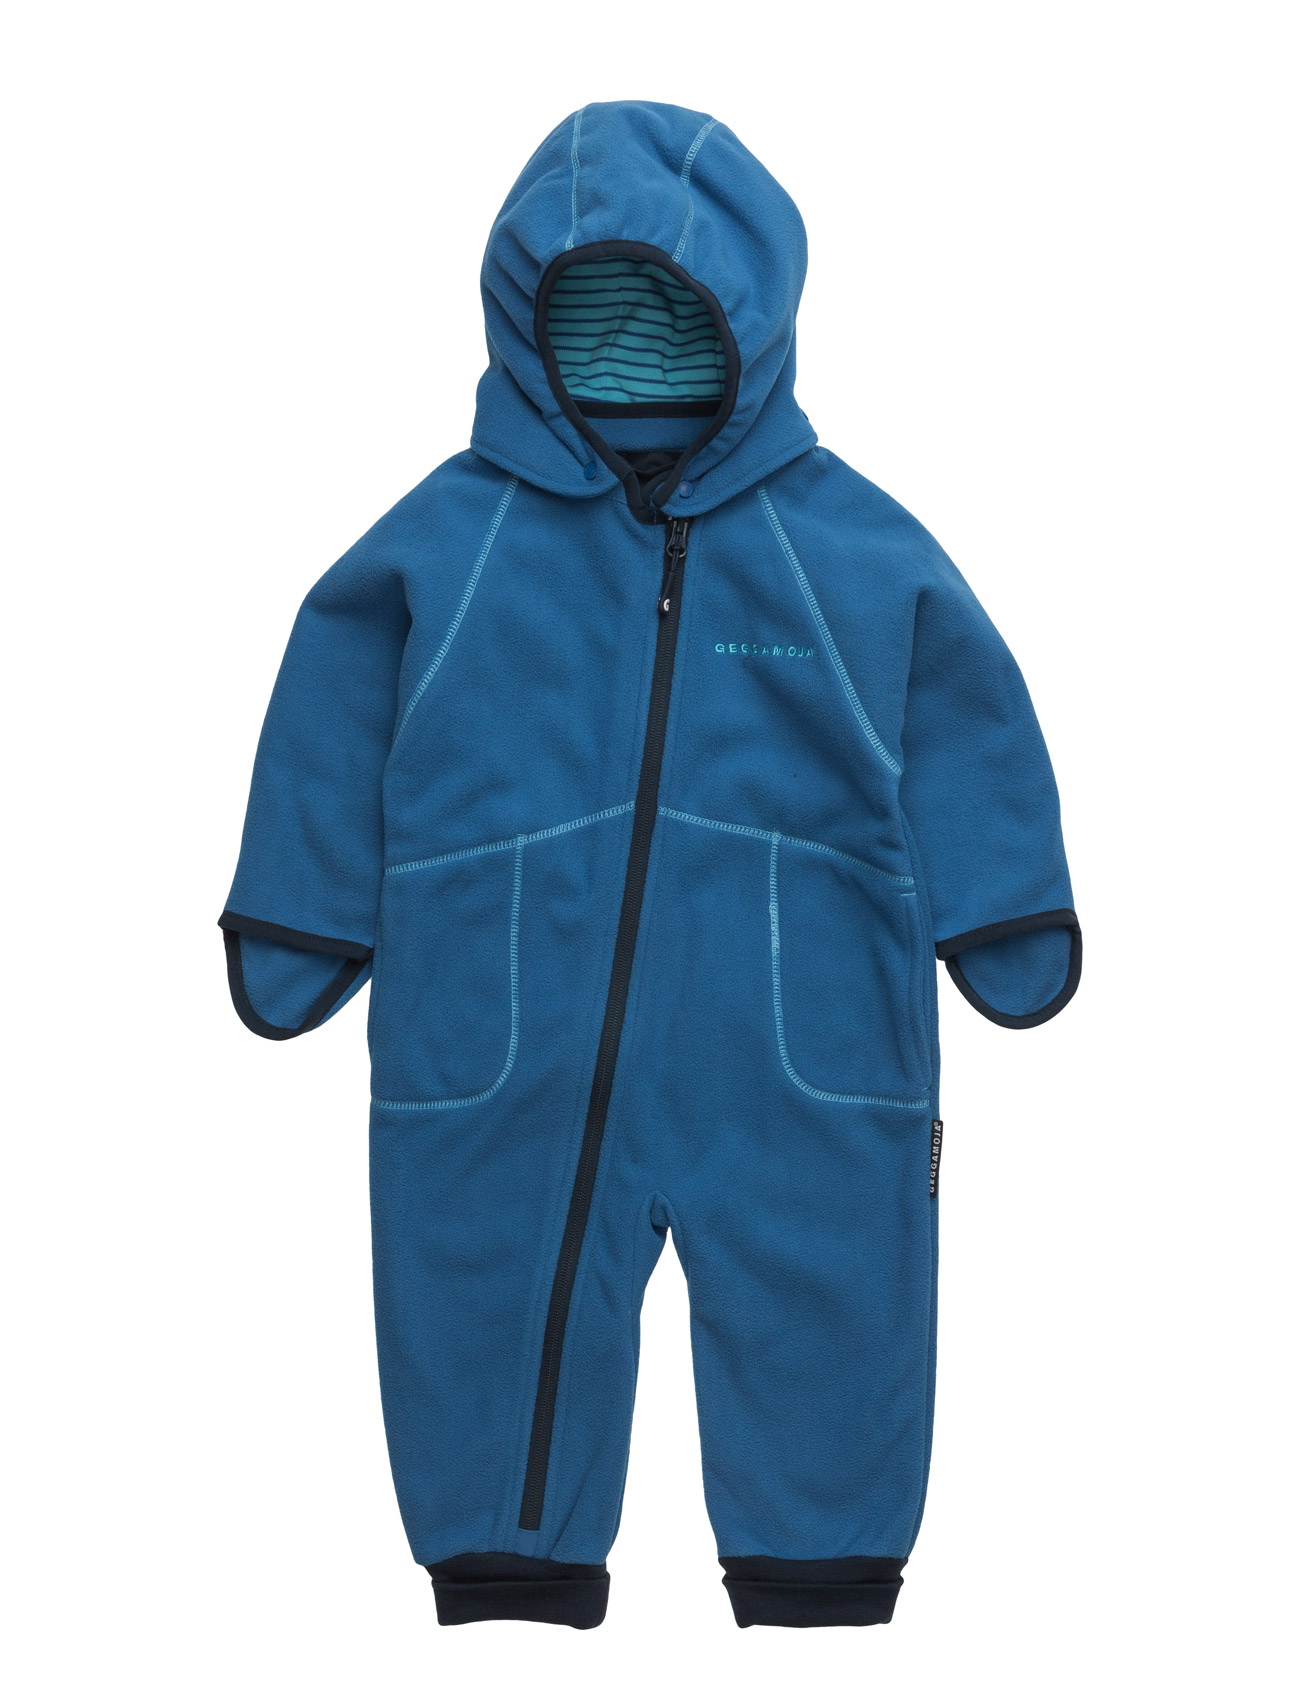 Wind Fleece Overall Geggamoja Overalls til Børn i Blå